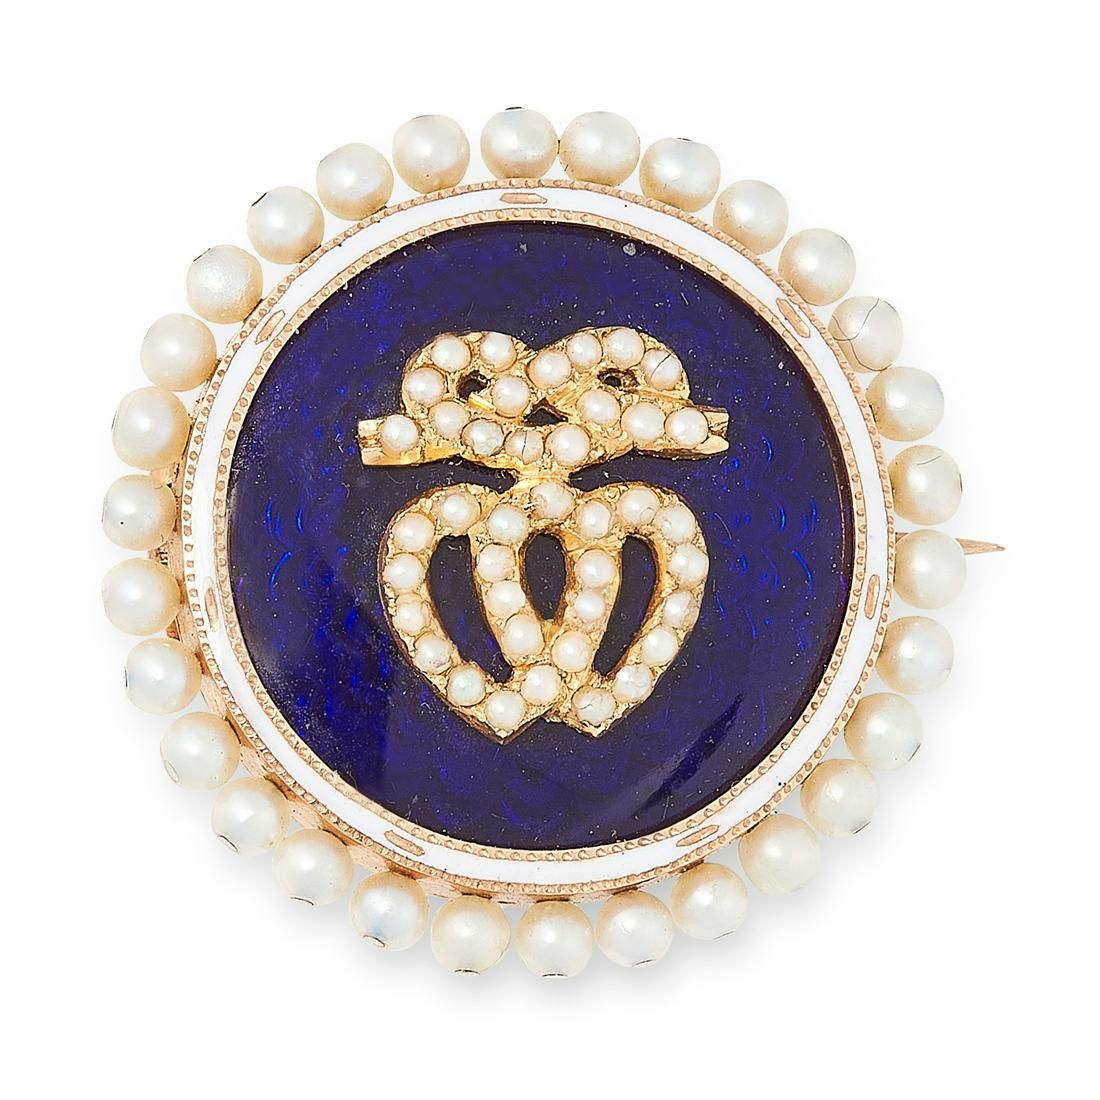 AN ANTIQUE DIAMOND, PEARL AND ENAMEL SWEETHEART BROOCH,